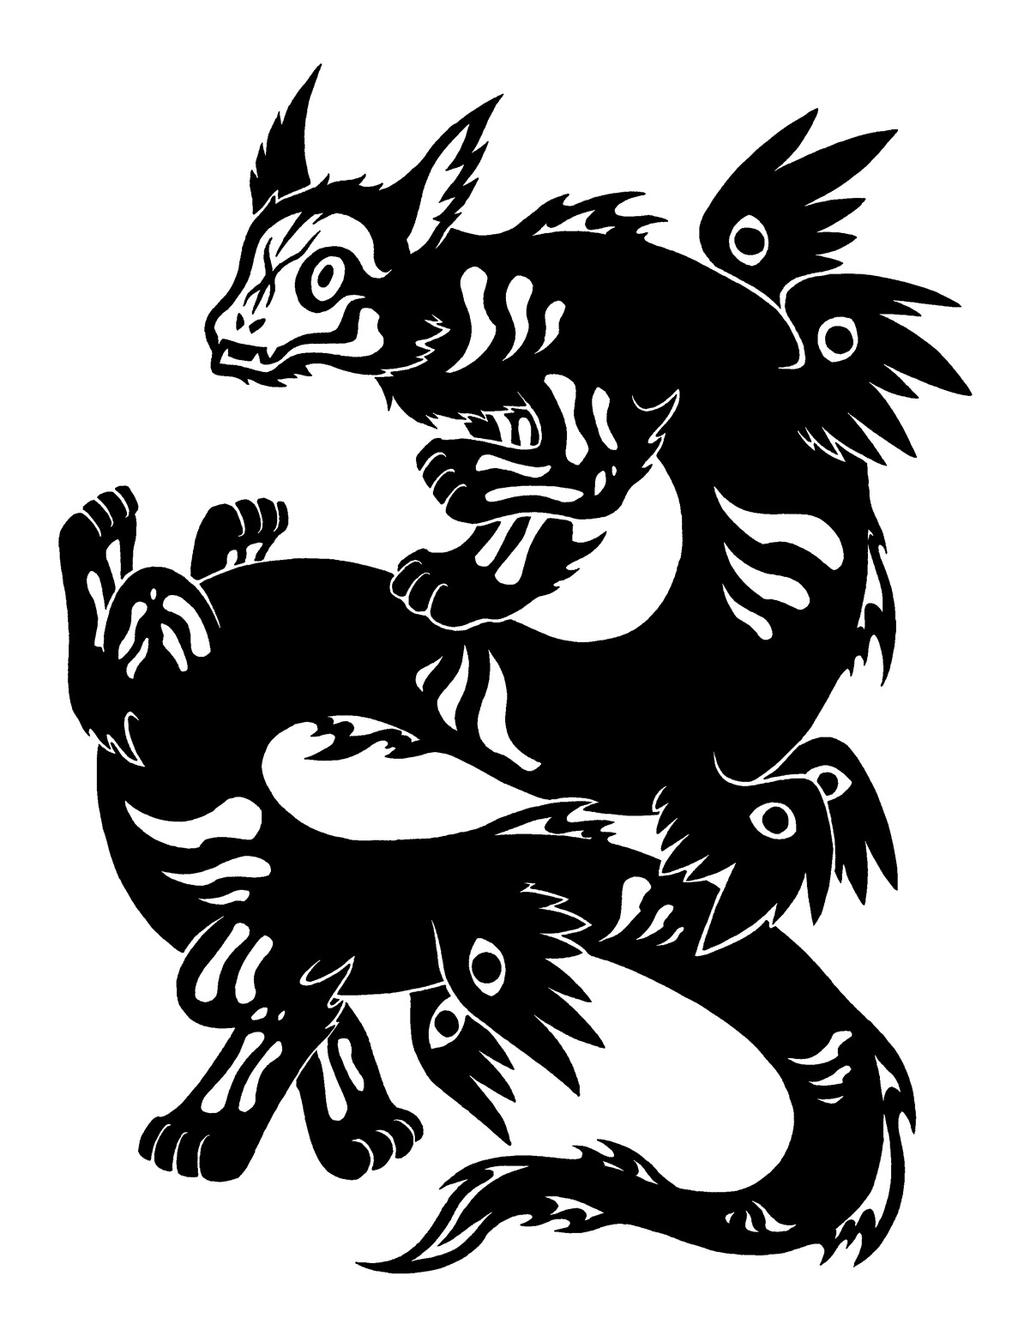 dragon_stuart_02_by_sunnyparallax-d8dgj0n.jpg